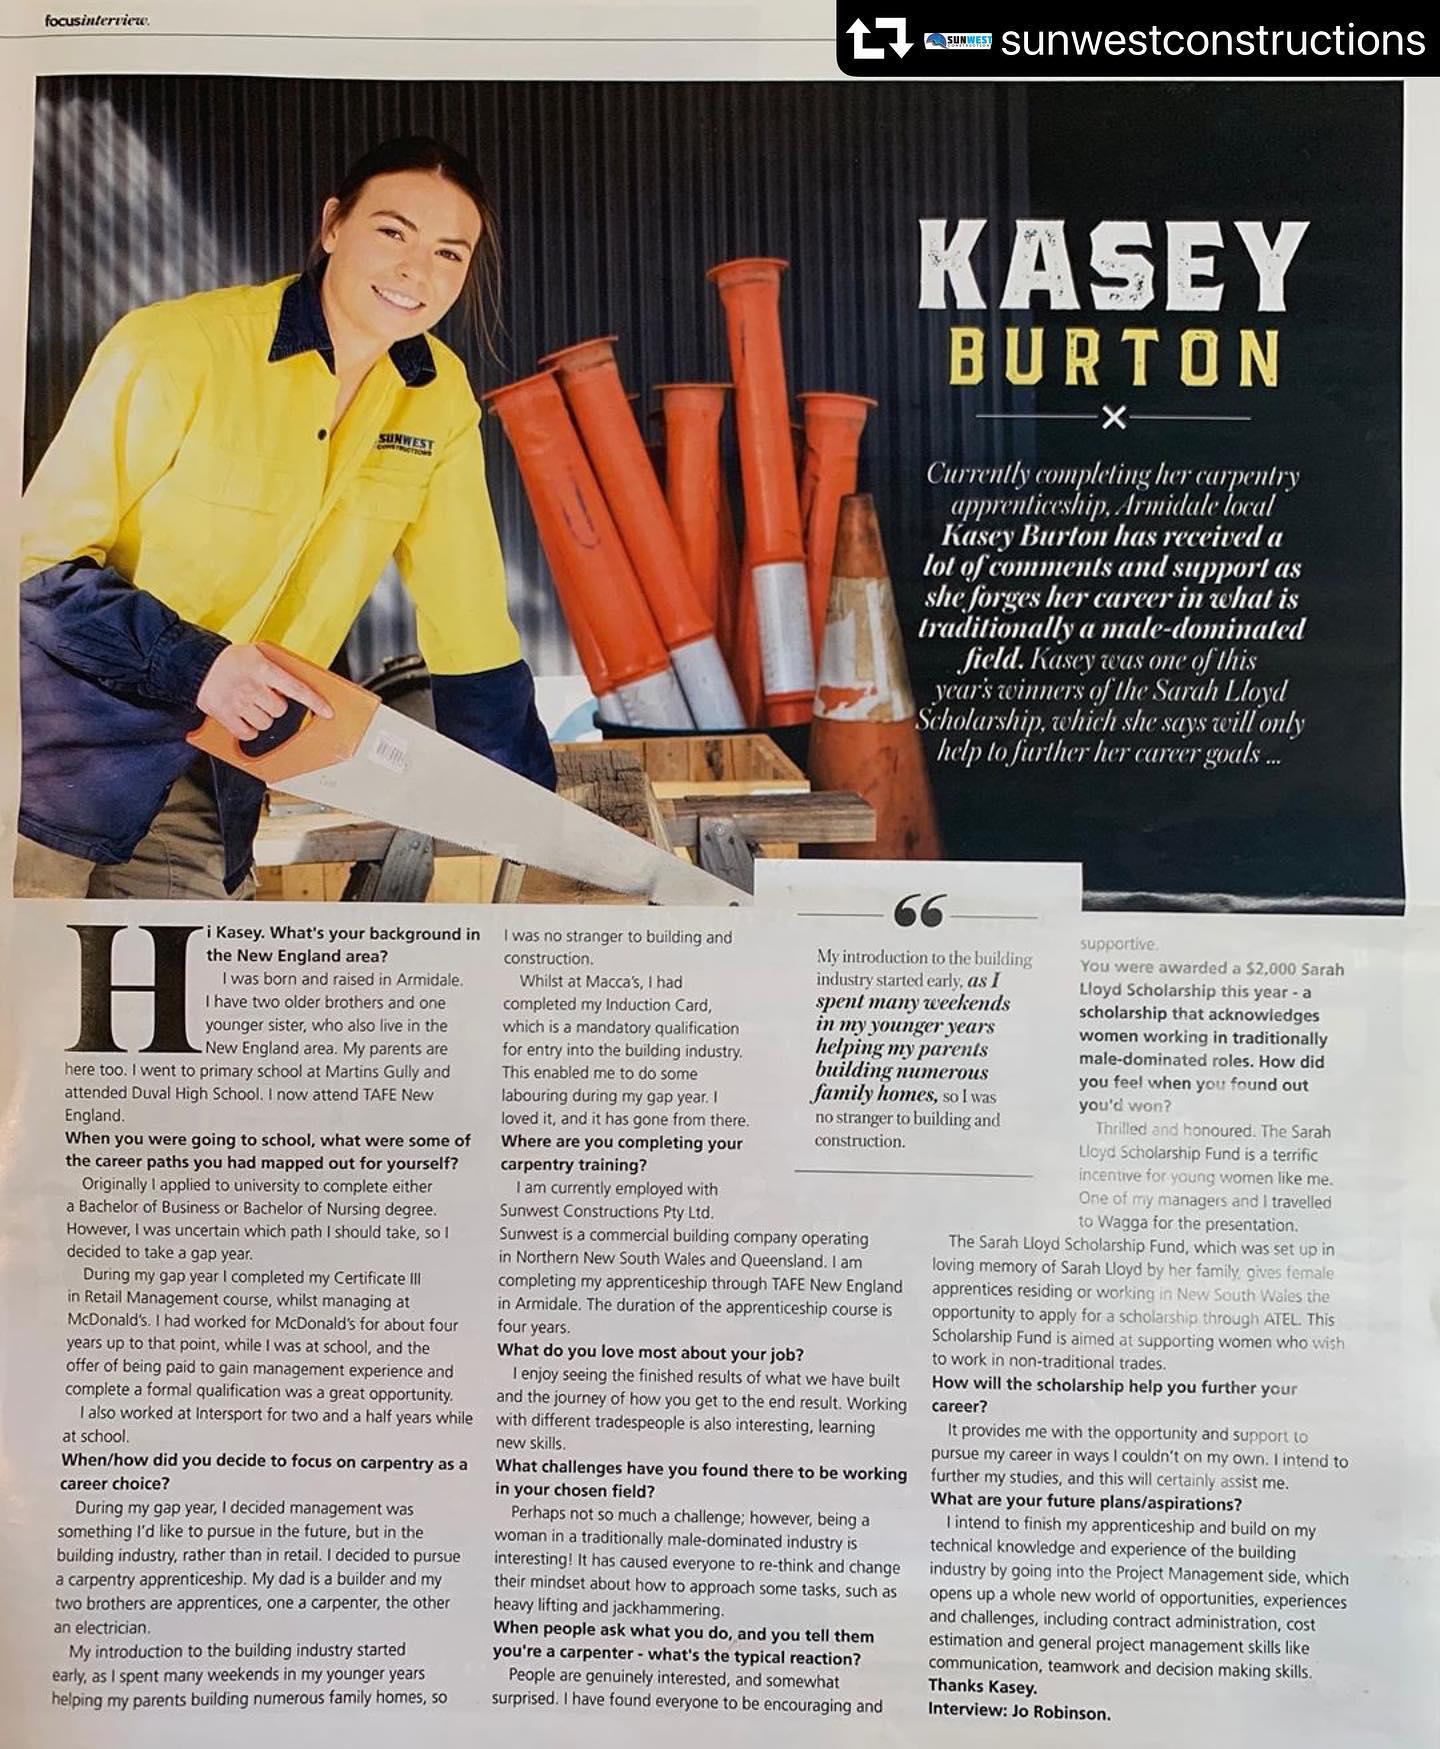 Kasey Burton